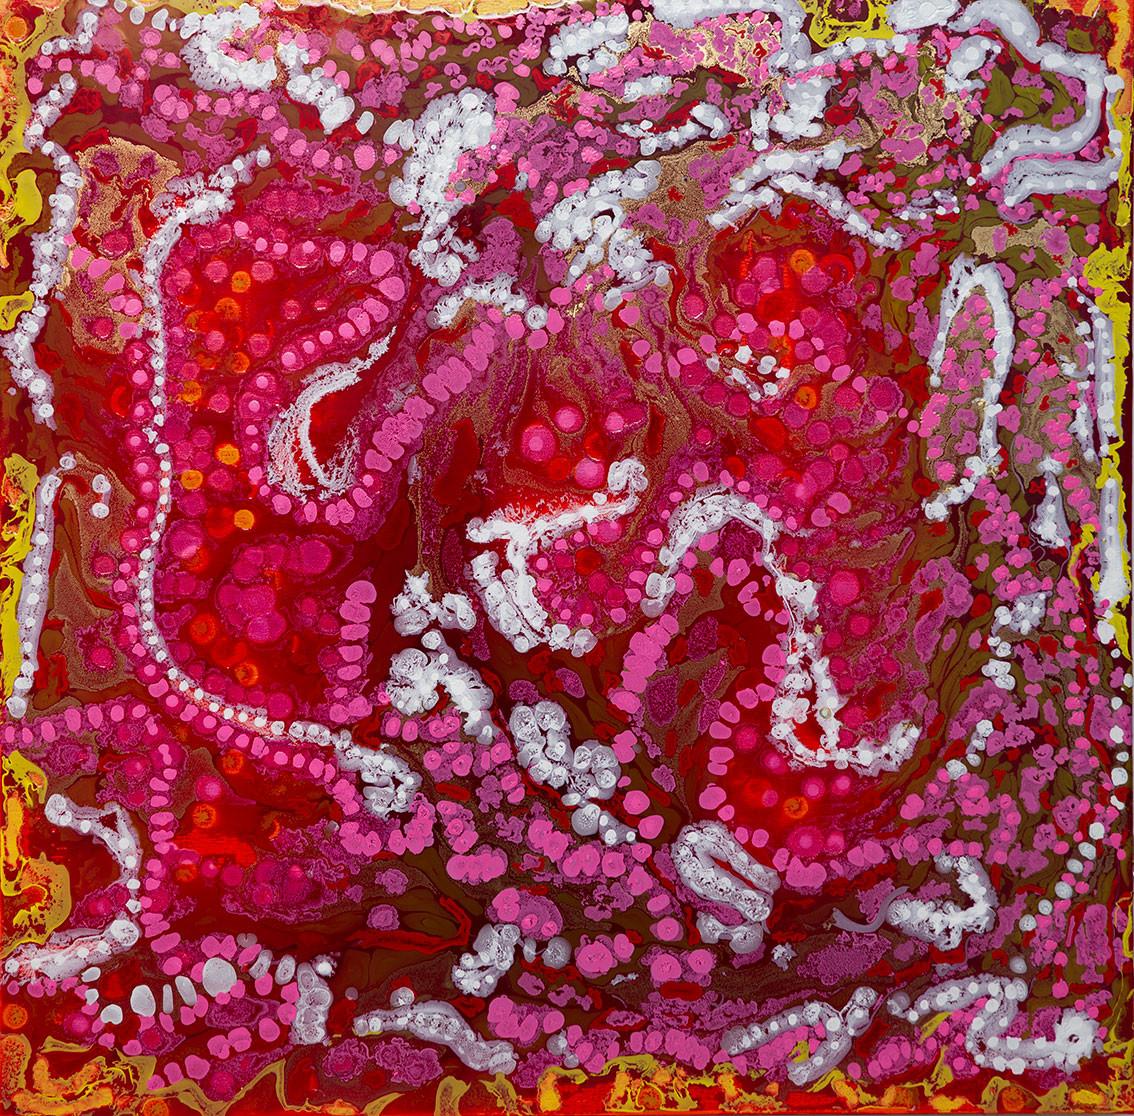 Color Movement nº 17 - mixed media on canvas - 100 cm x 100 cm - 2019